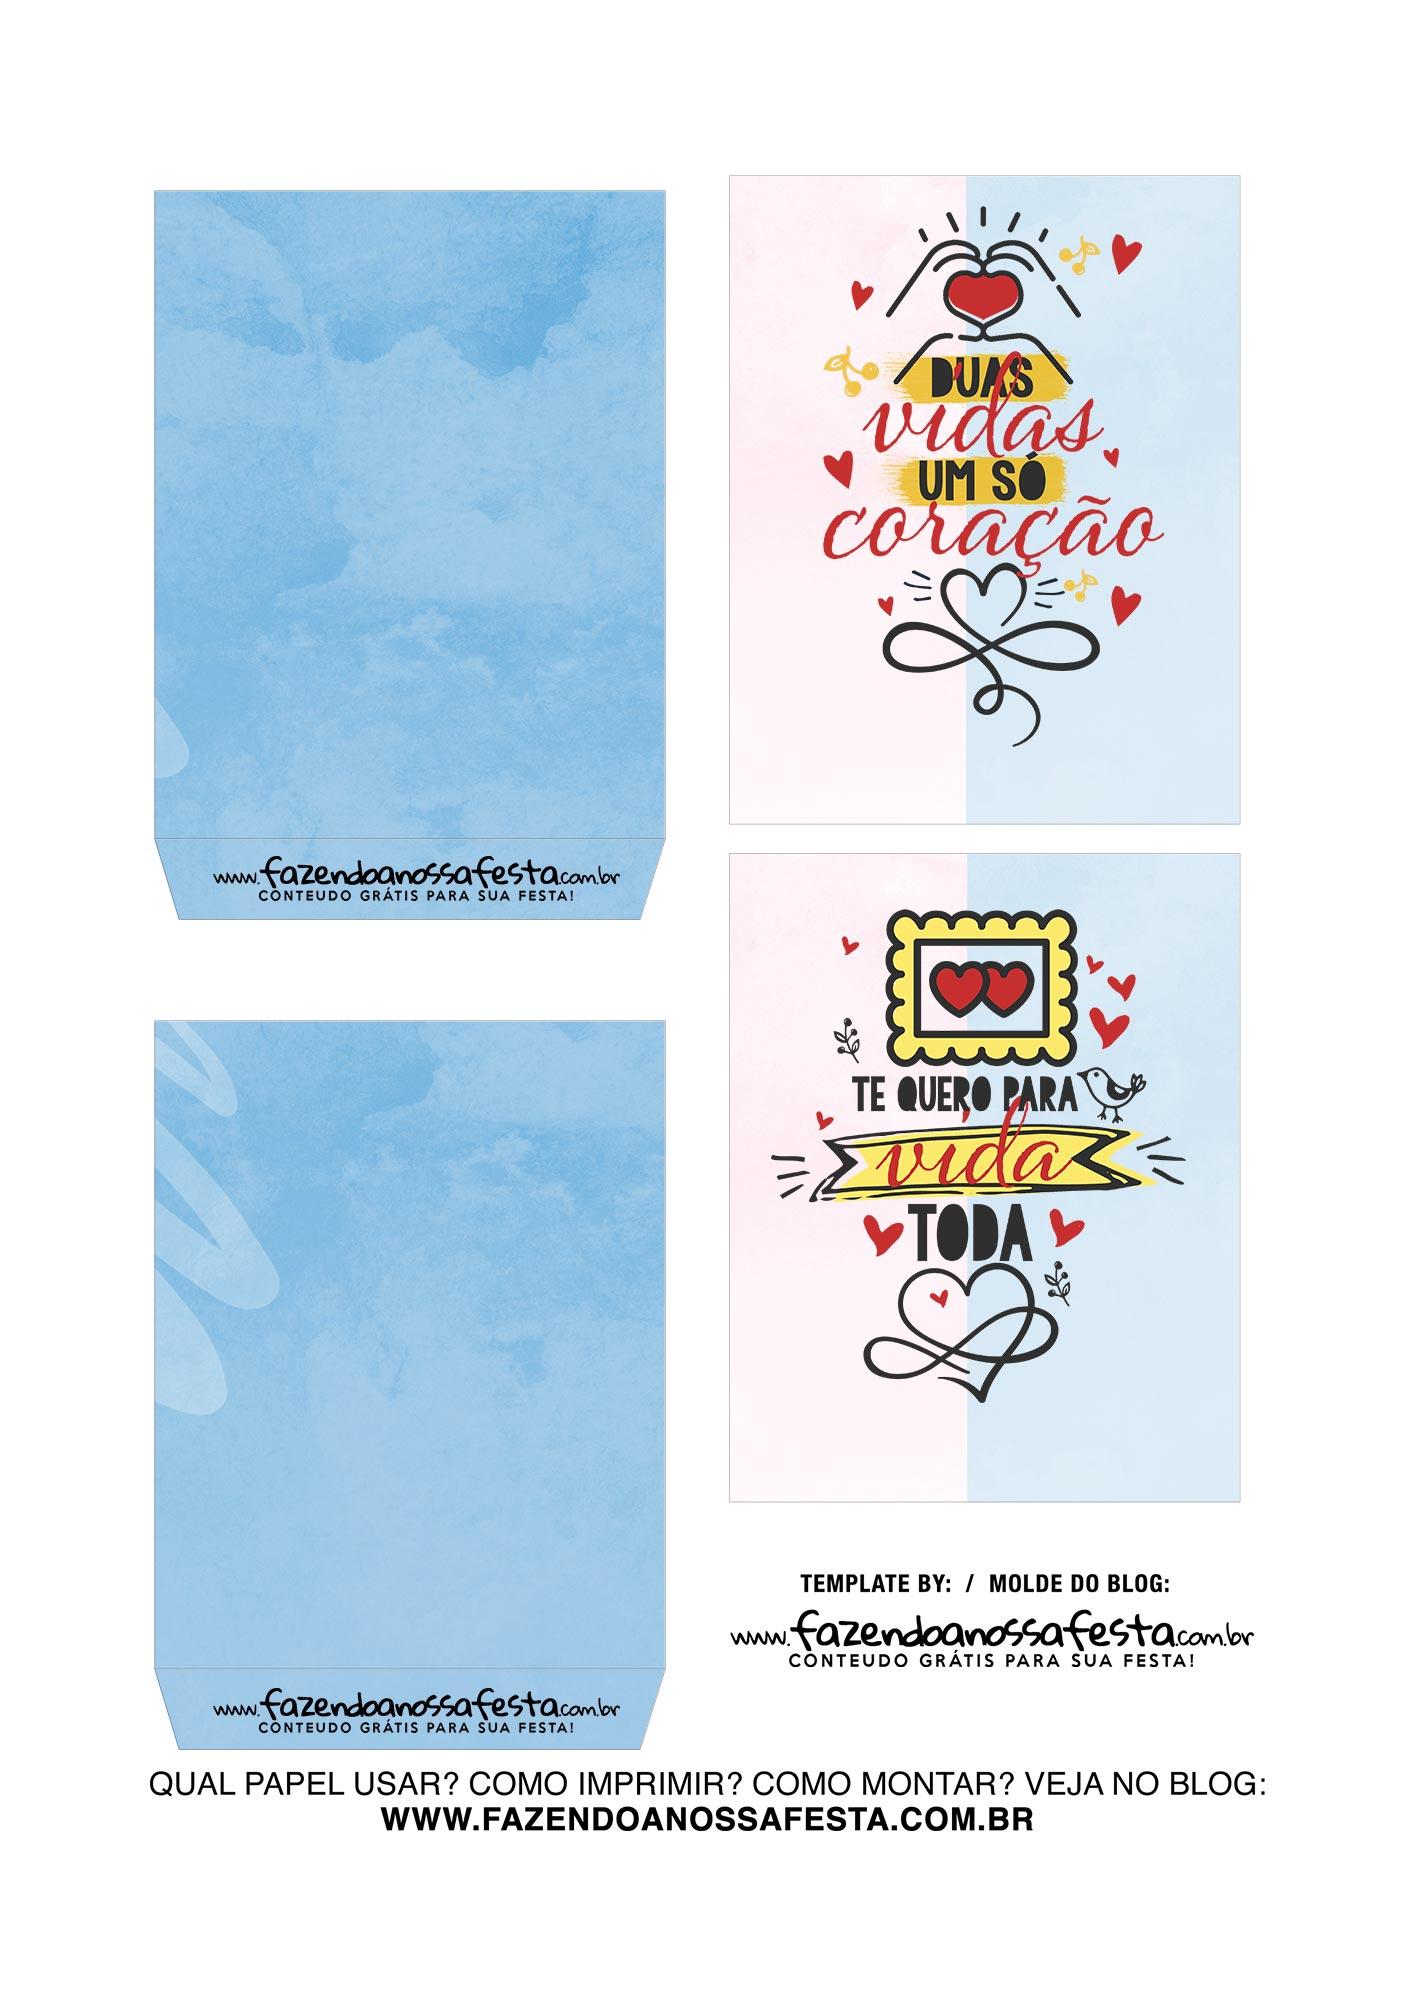 Caixa Explosiva Dia dos Namorados Rosa e Azul 3